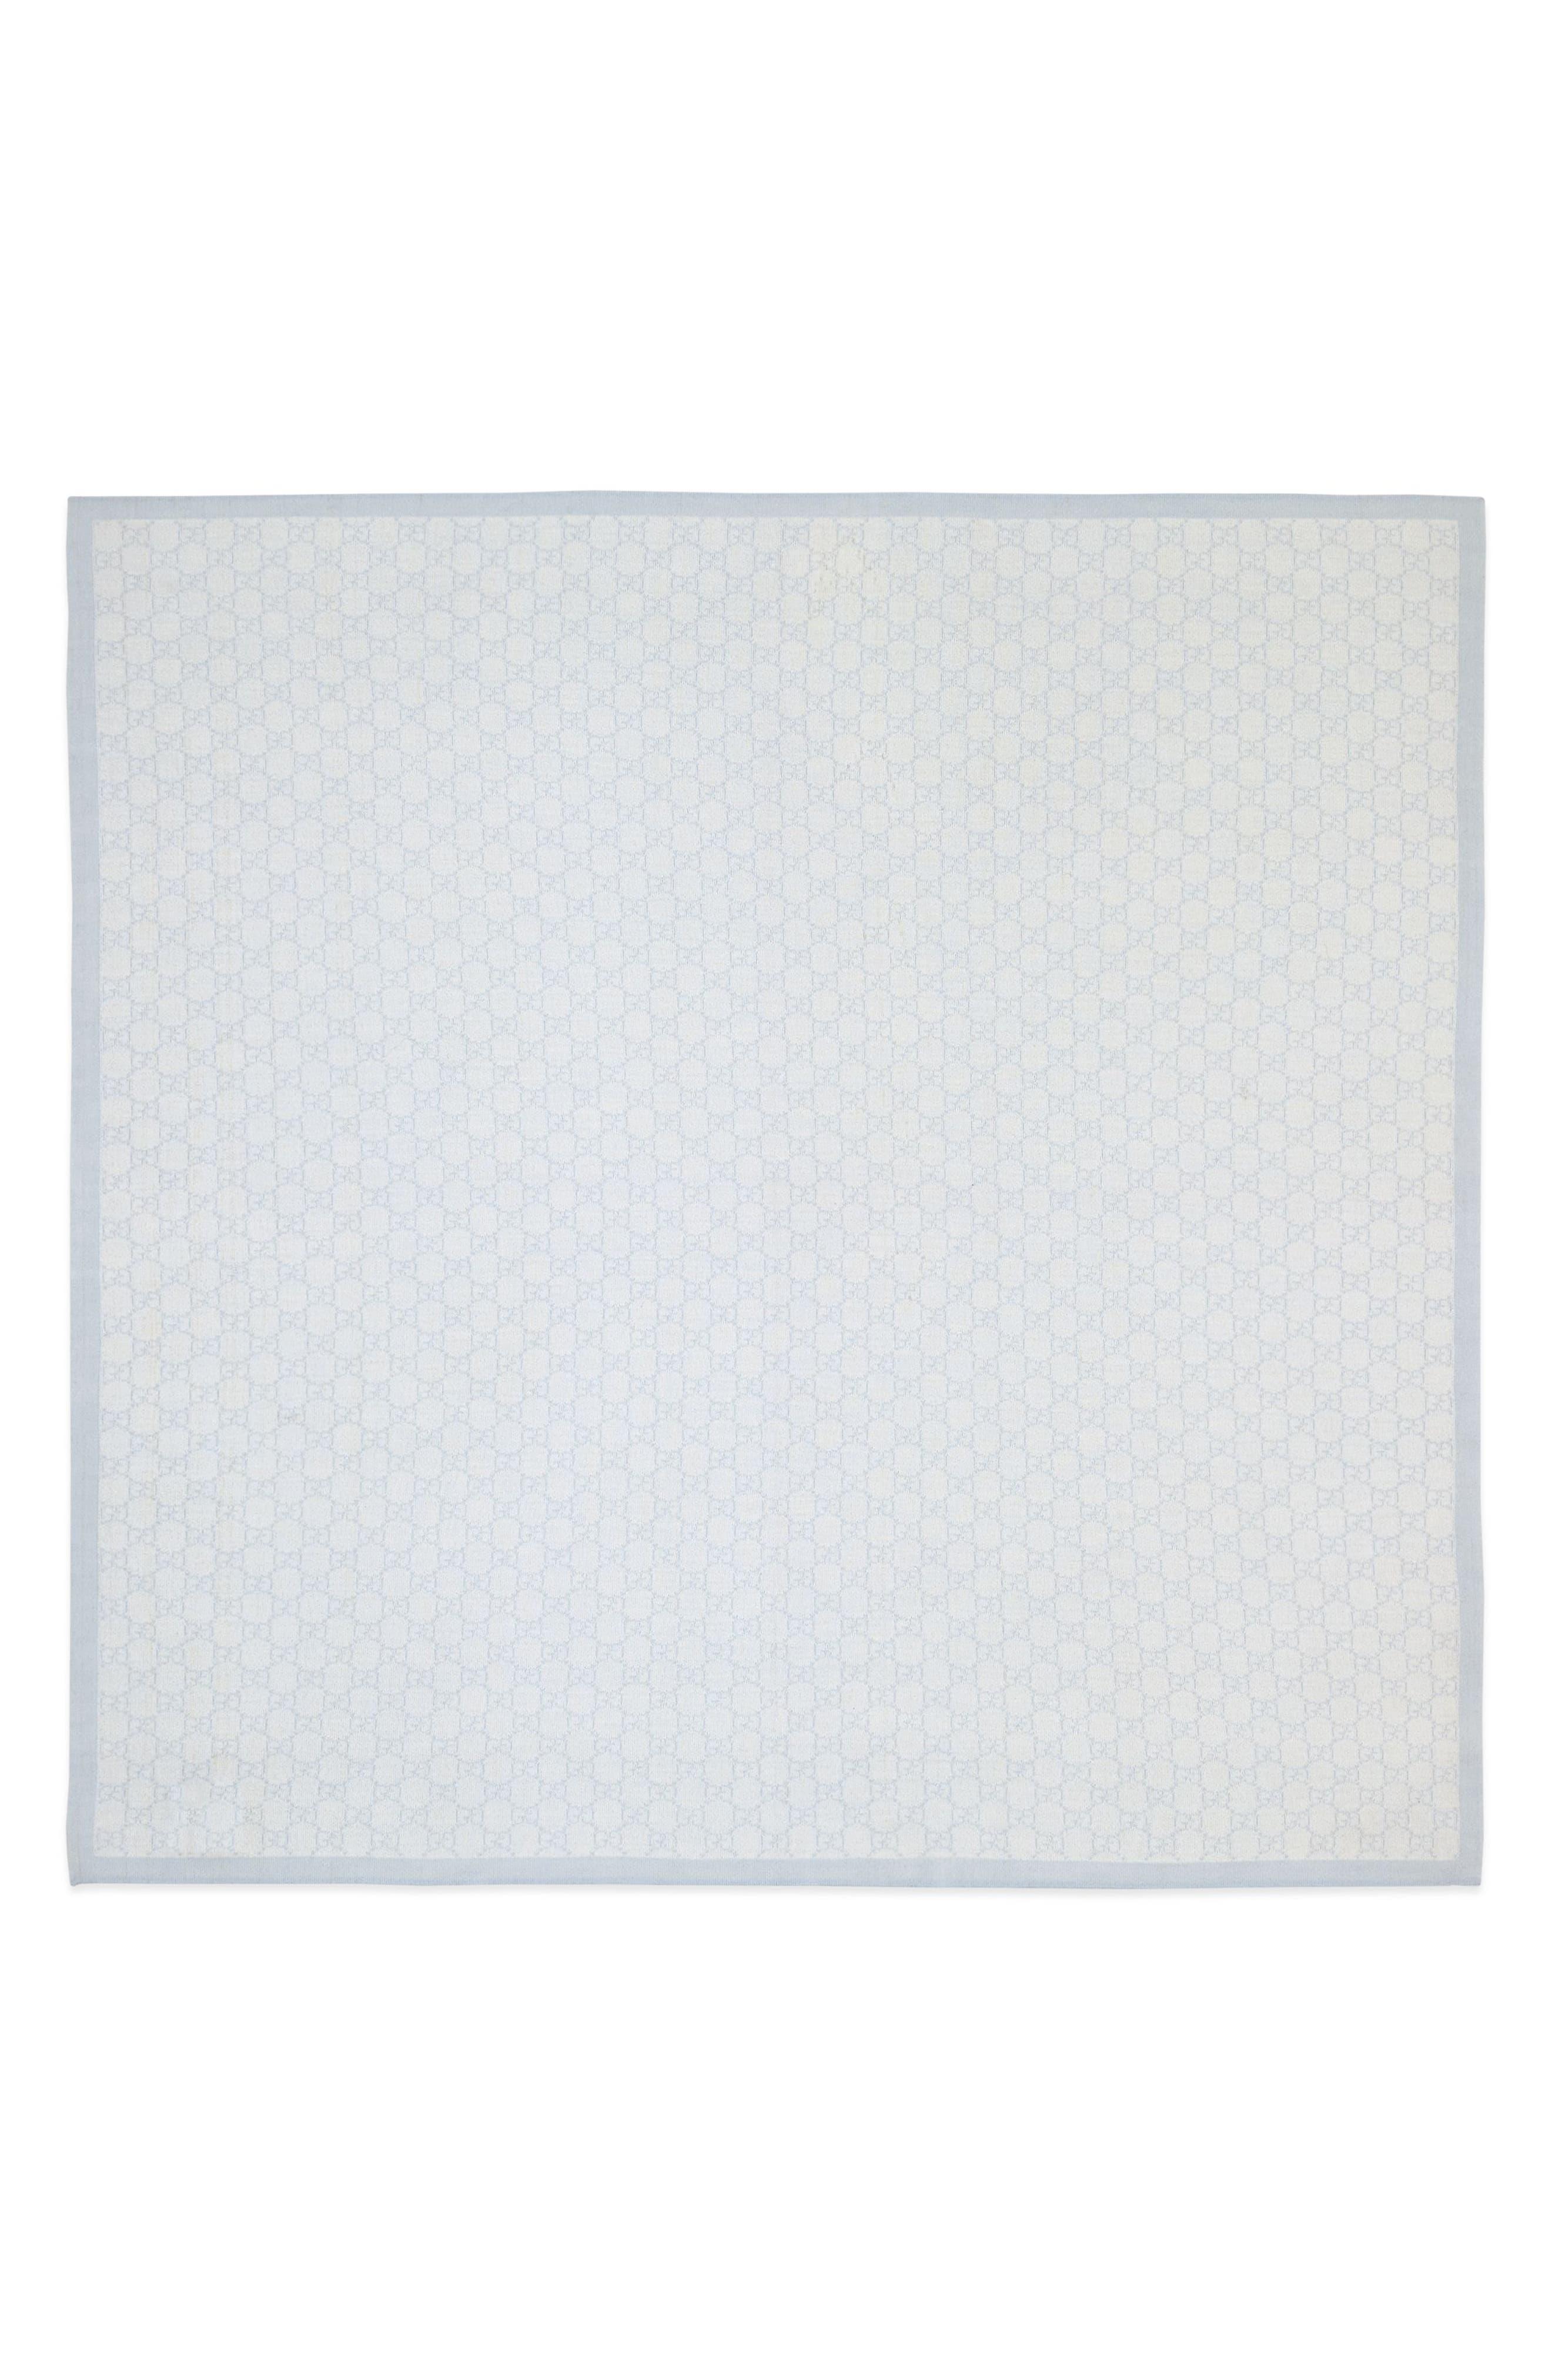 Wool Baby Blanket,                             Alternate thumbnail 3, color,                             IVORY/ SKY BLUE